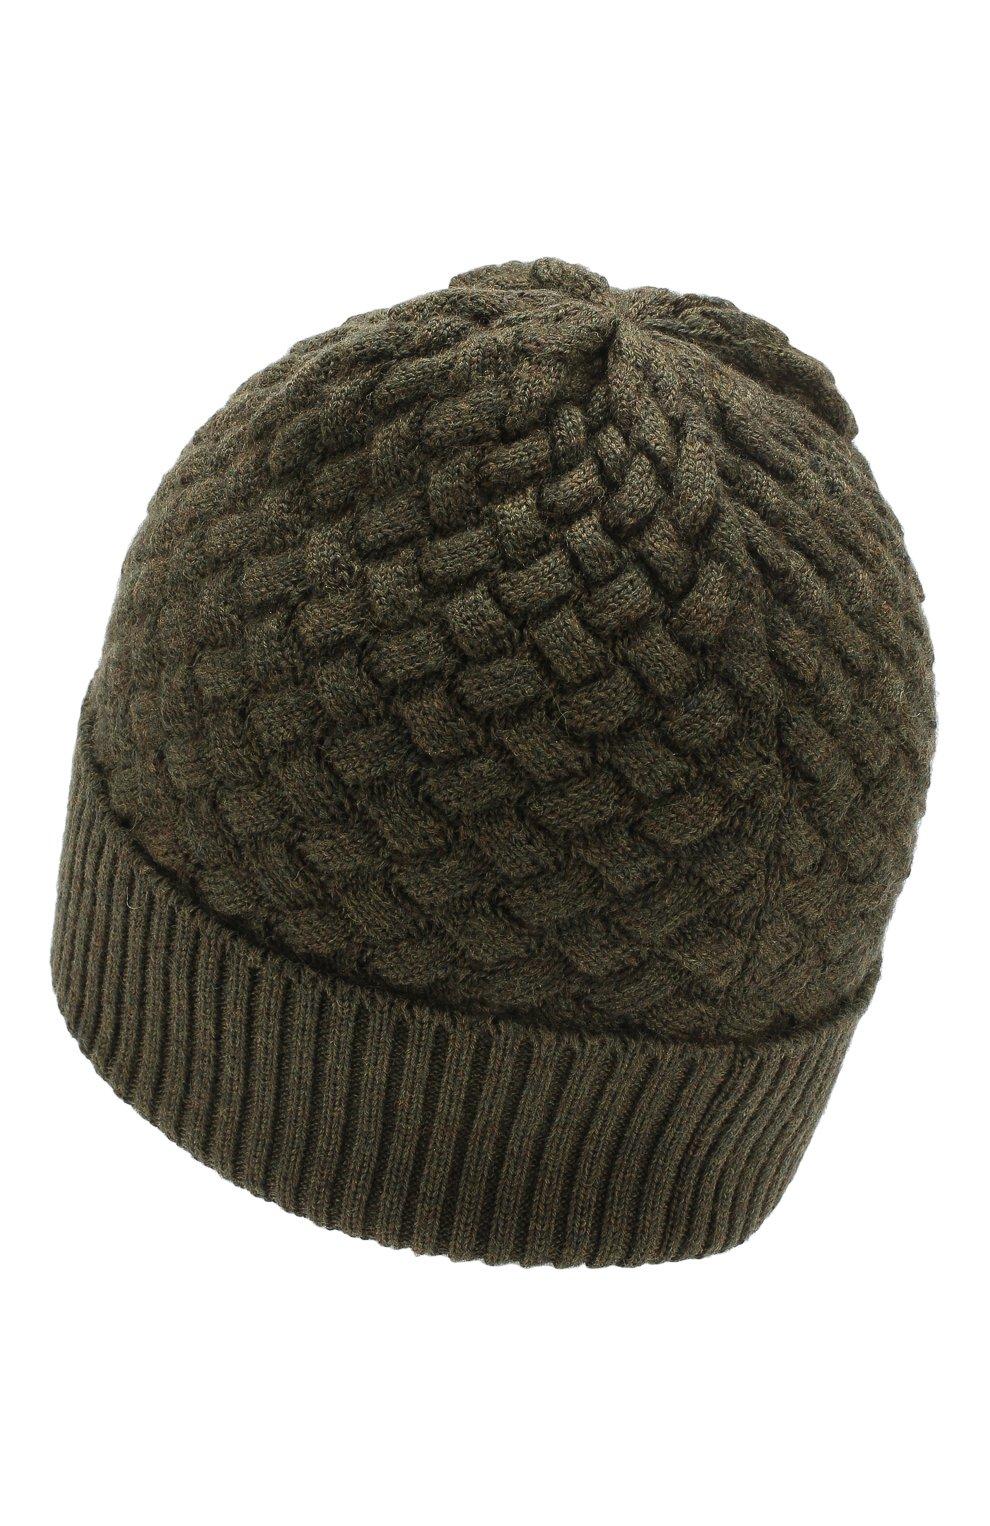 Женская шерстяная шапка BOTTEGA VENETA зеленого цвета, арт. 500396/4V206 | Фото 2